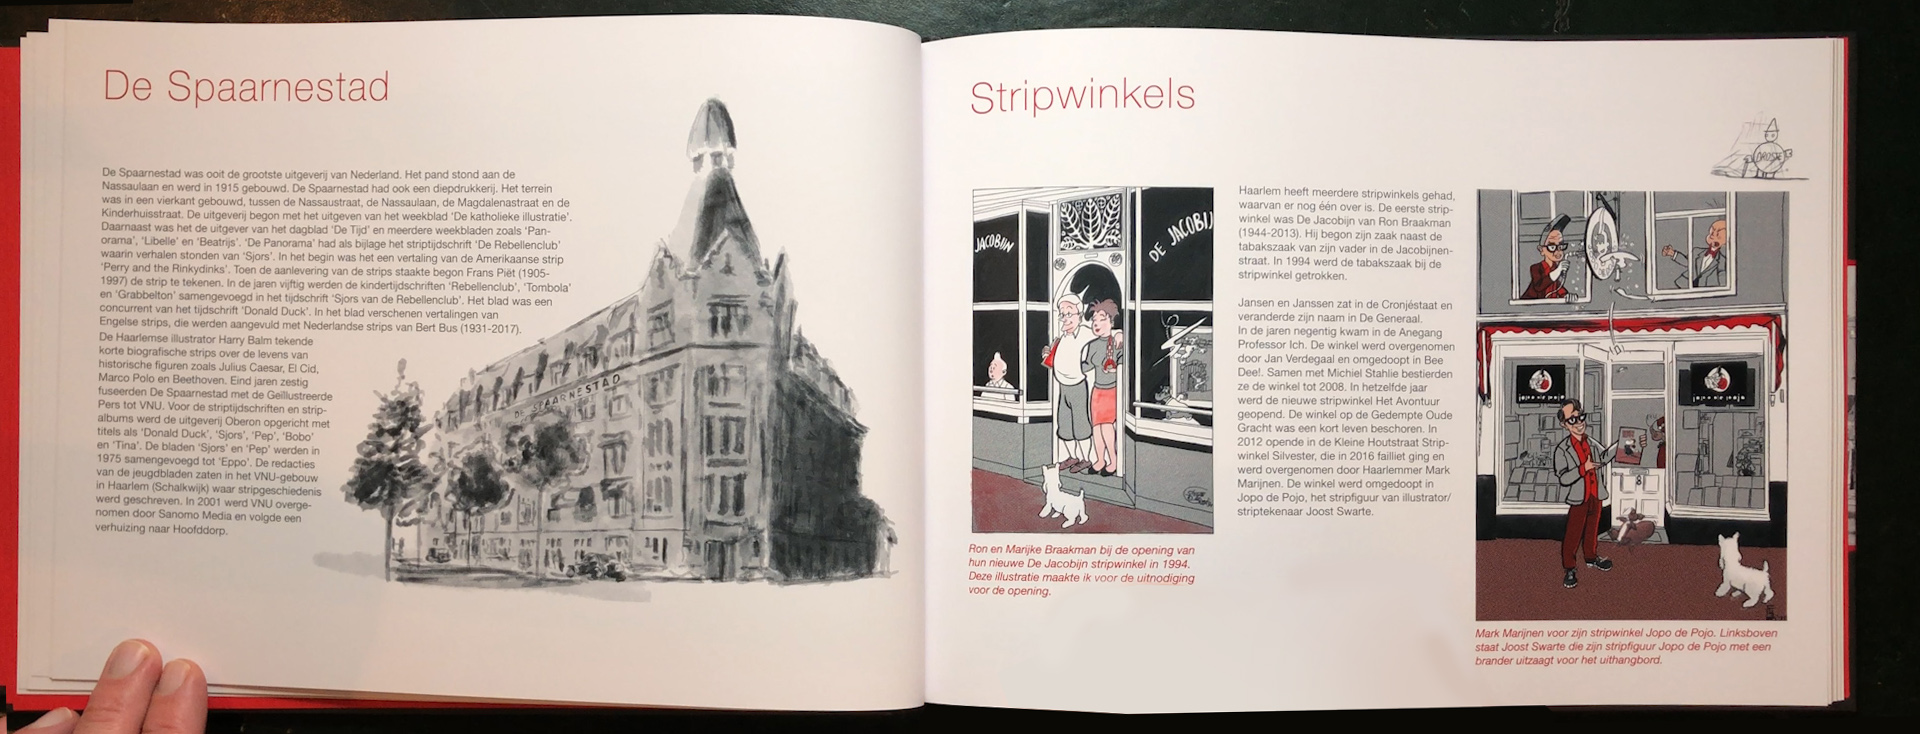 Het Spaarne Stroomt -Ode aan Haarlem Strips